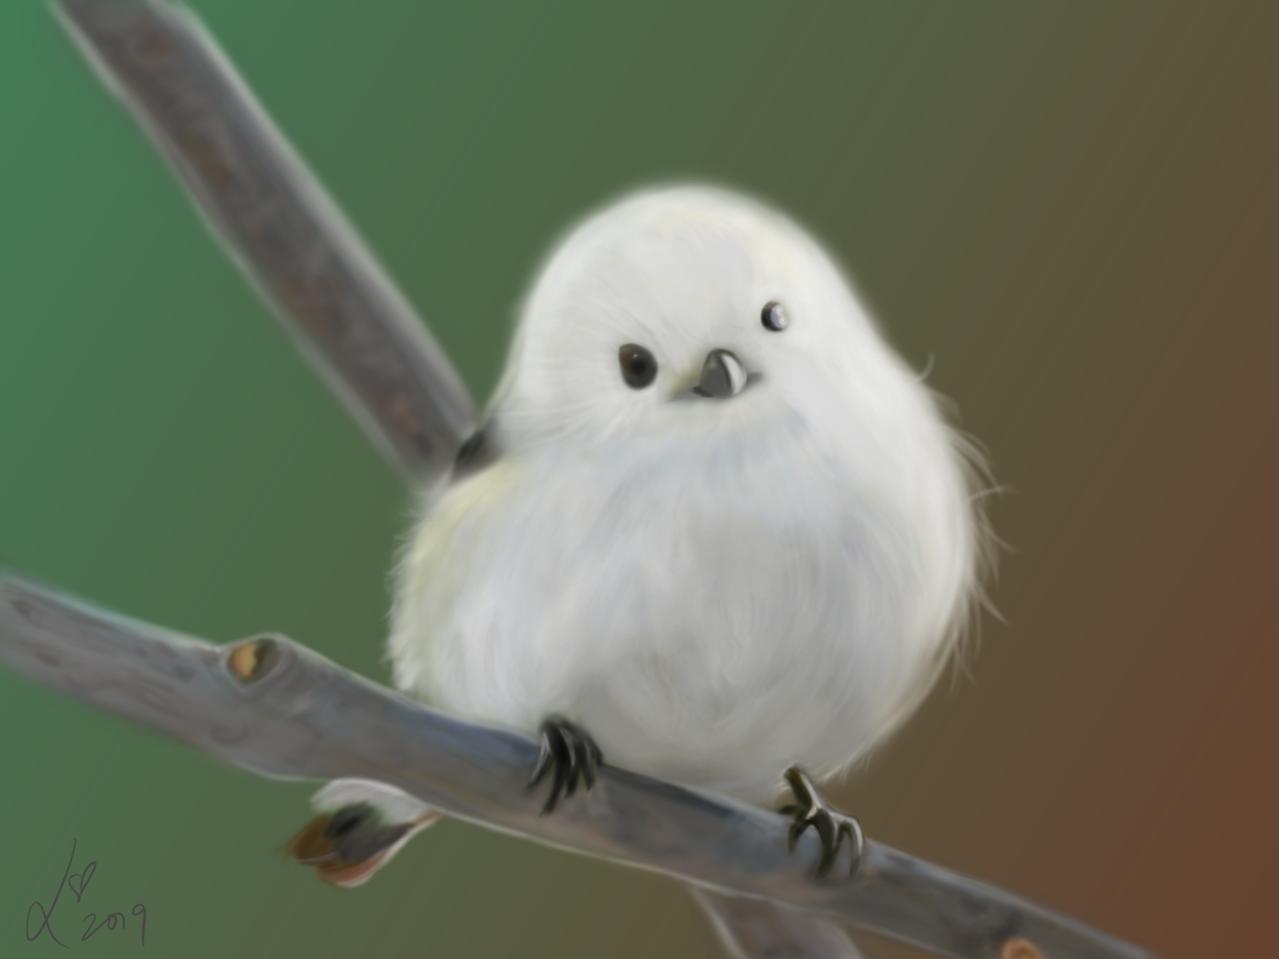 雪球鳥 Illust of 玲兒